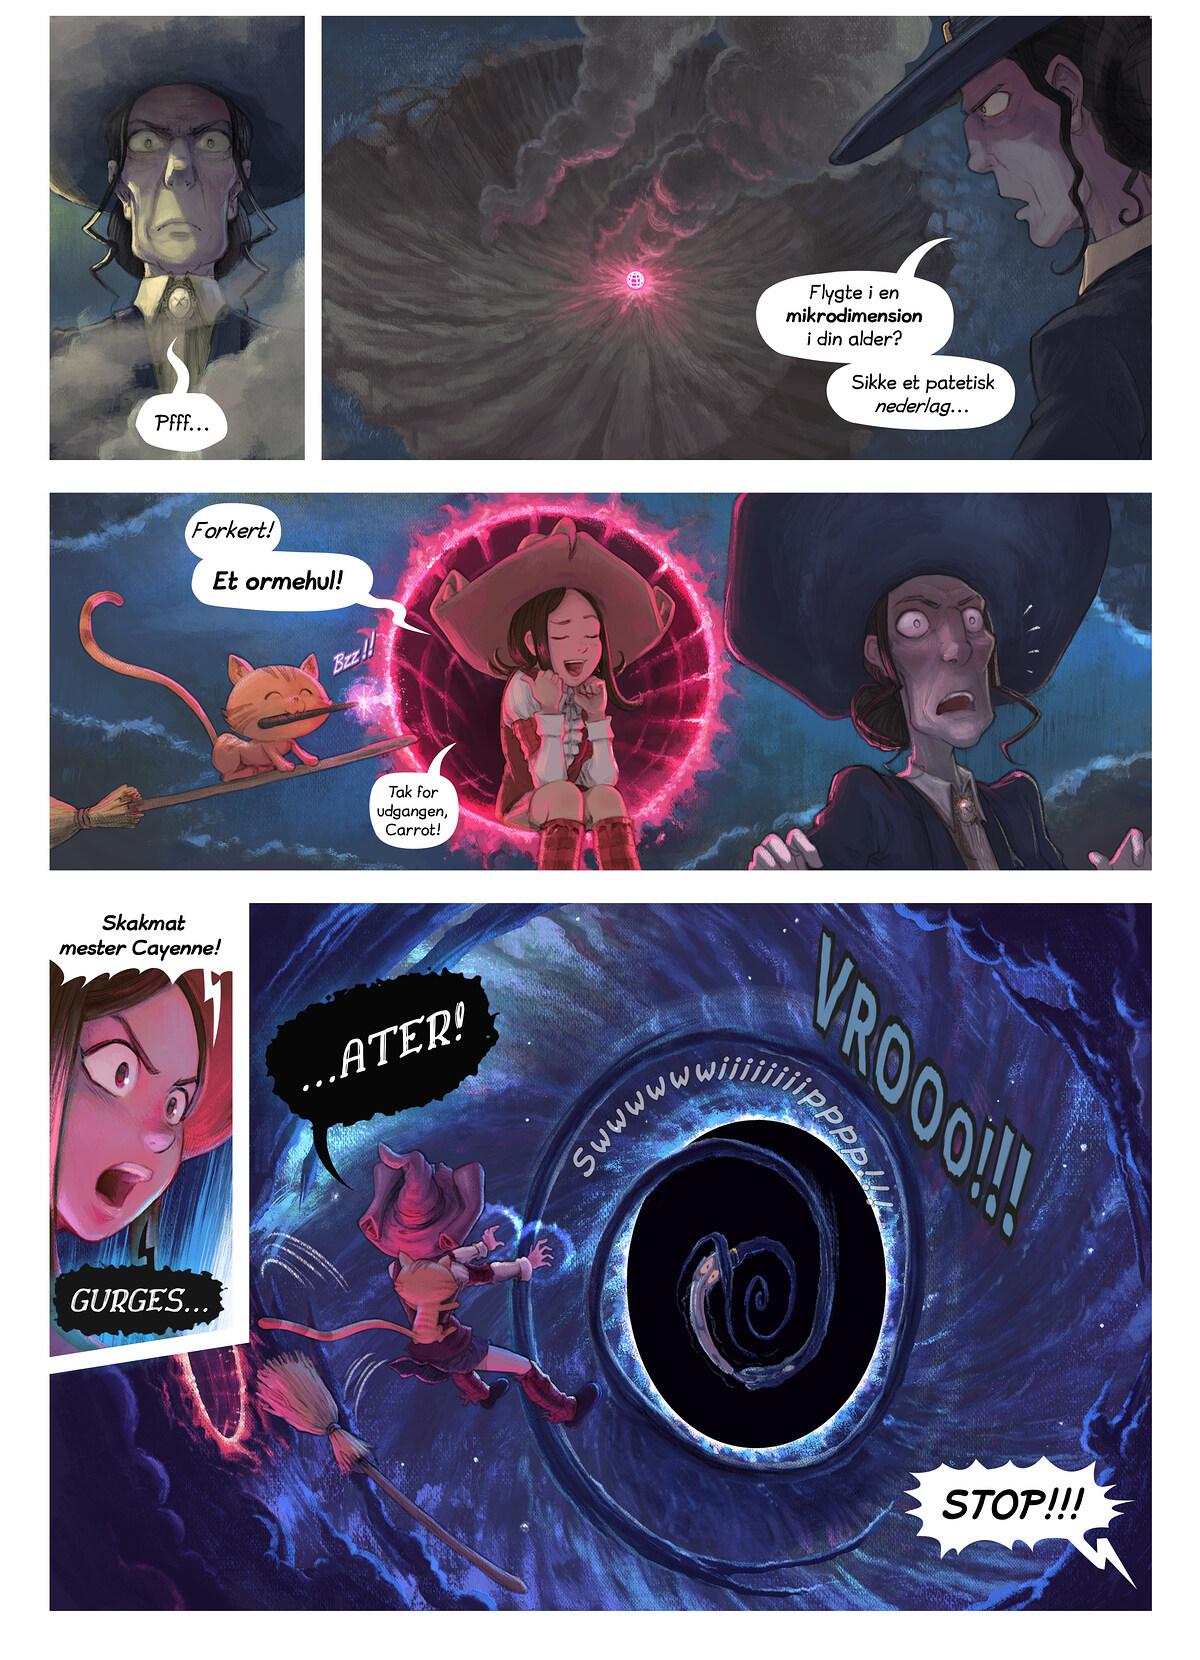 Episode 31: Kampen, Page 5